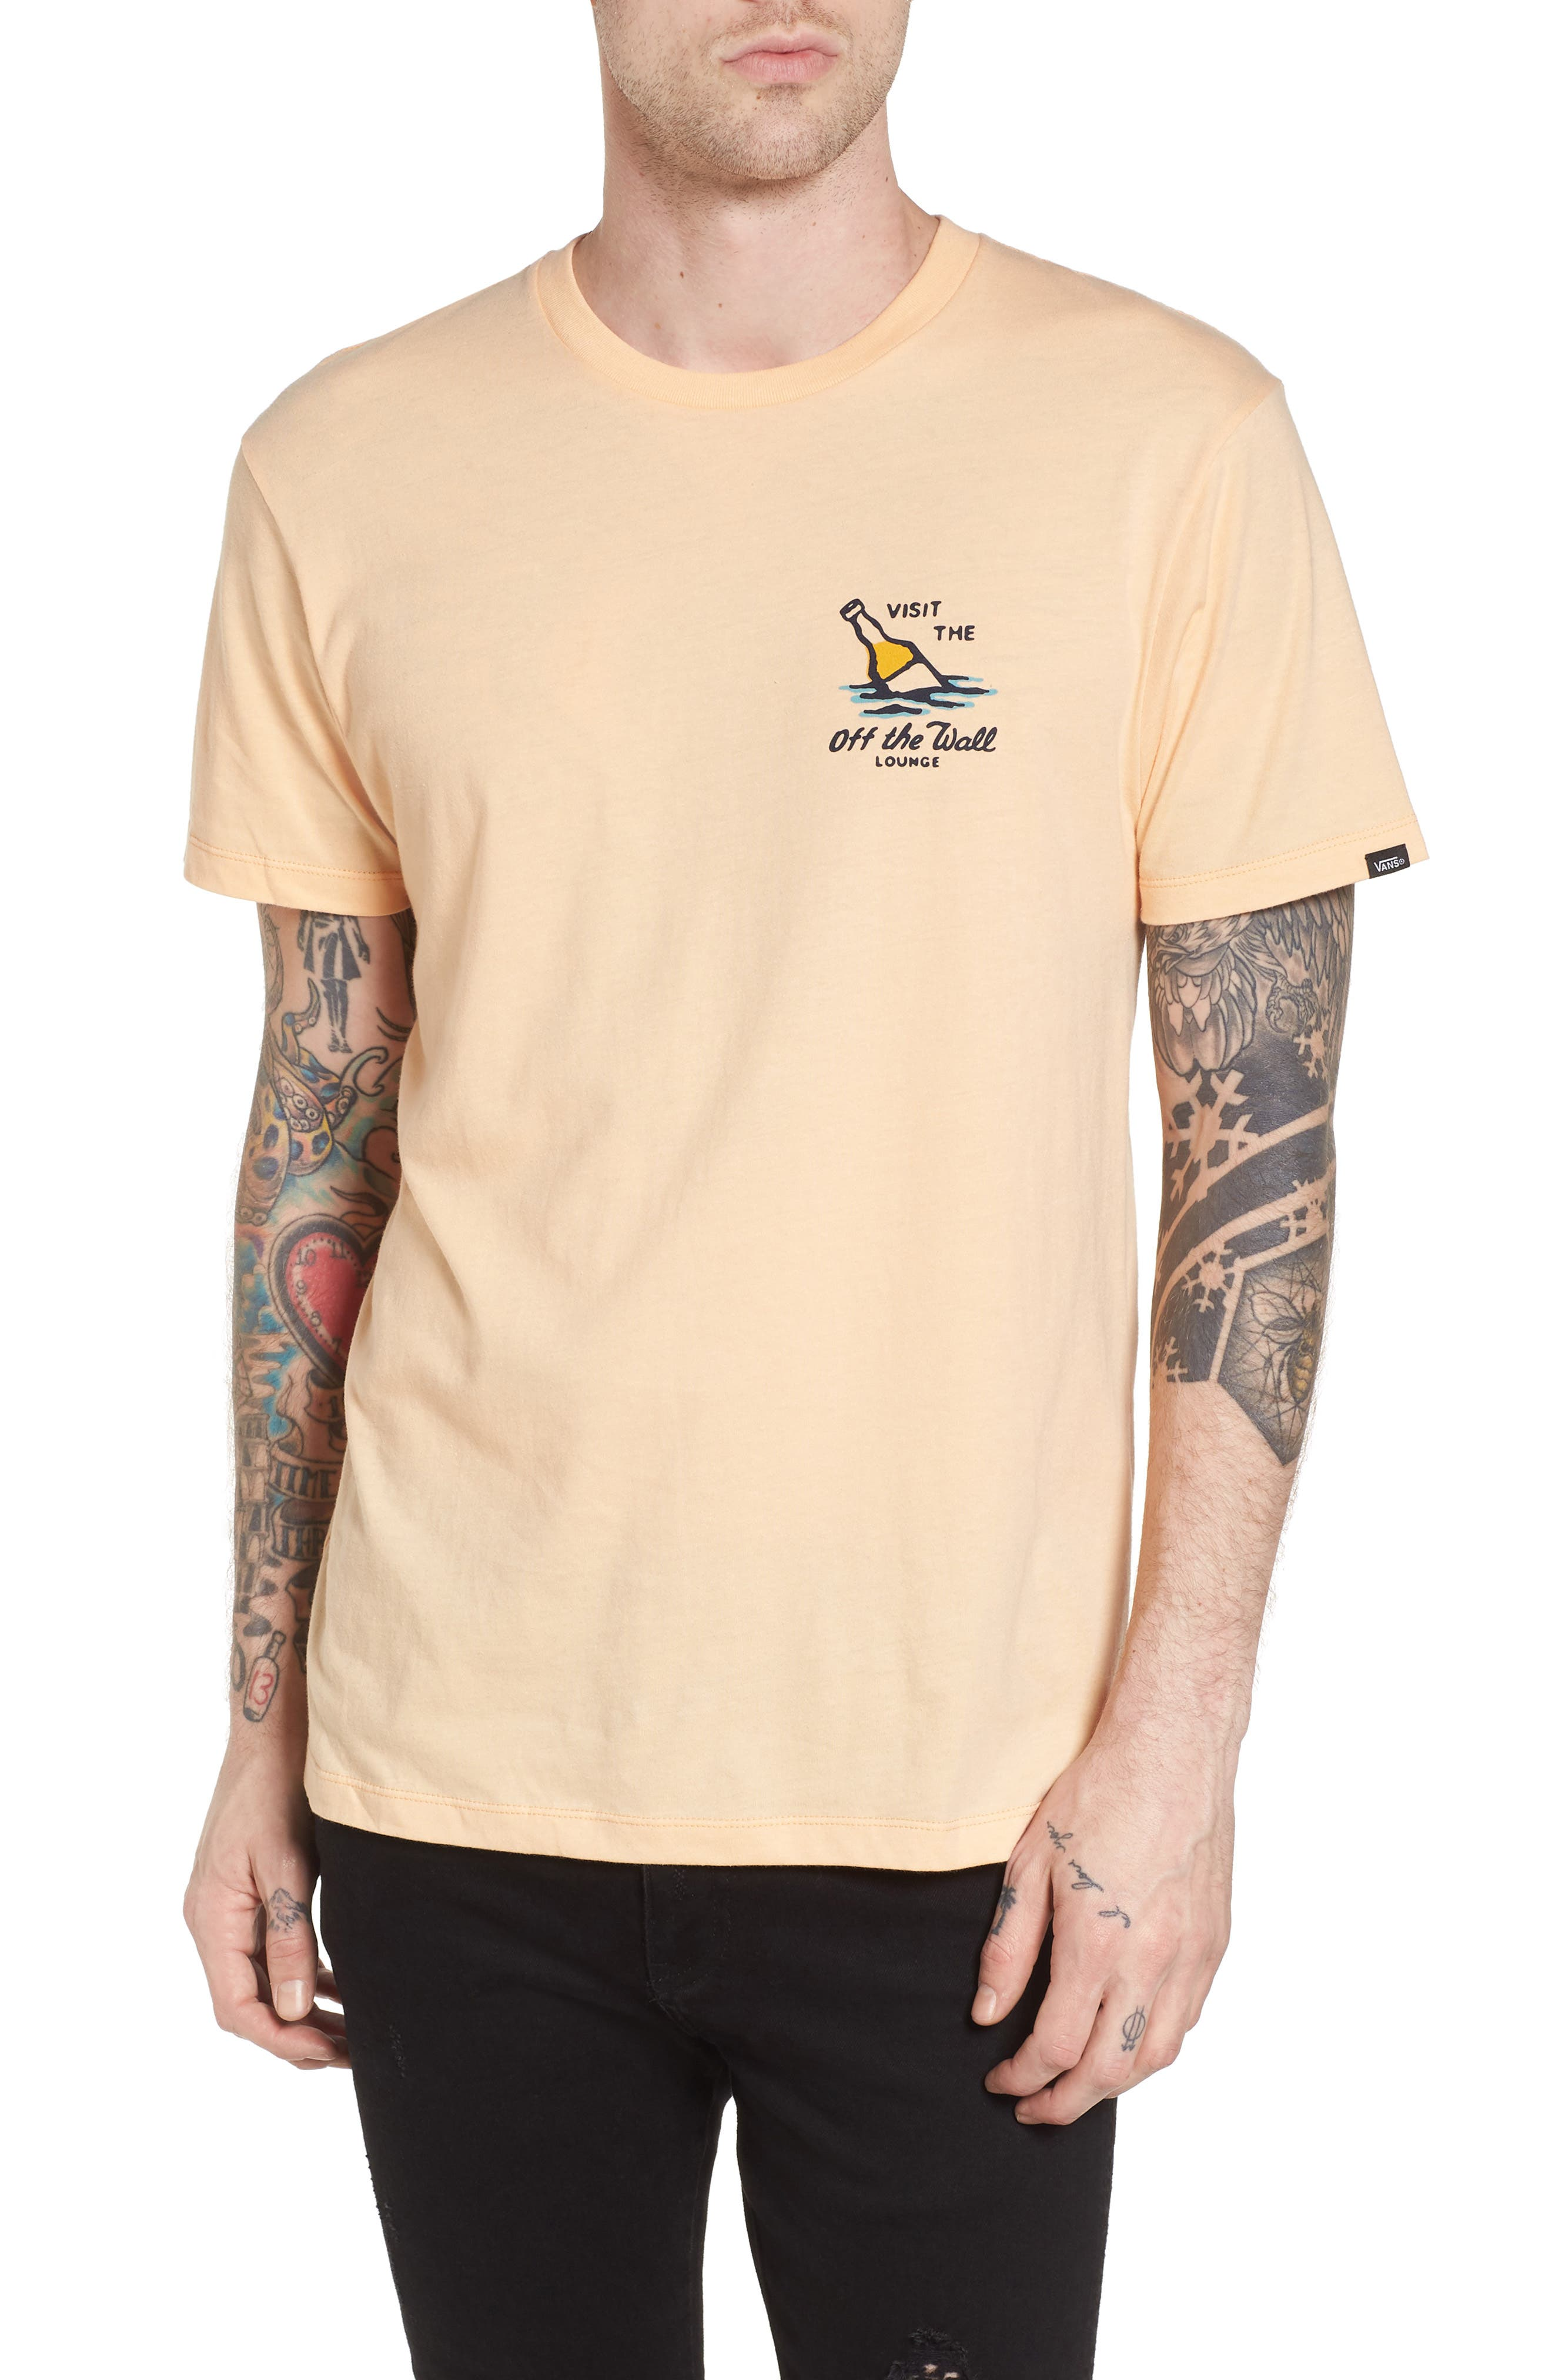 Off the Wall Lounge T-Shirt,                             Main thumbnail 1, color,                             810